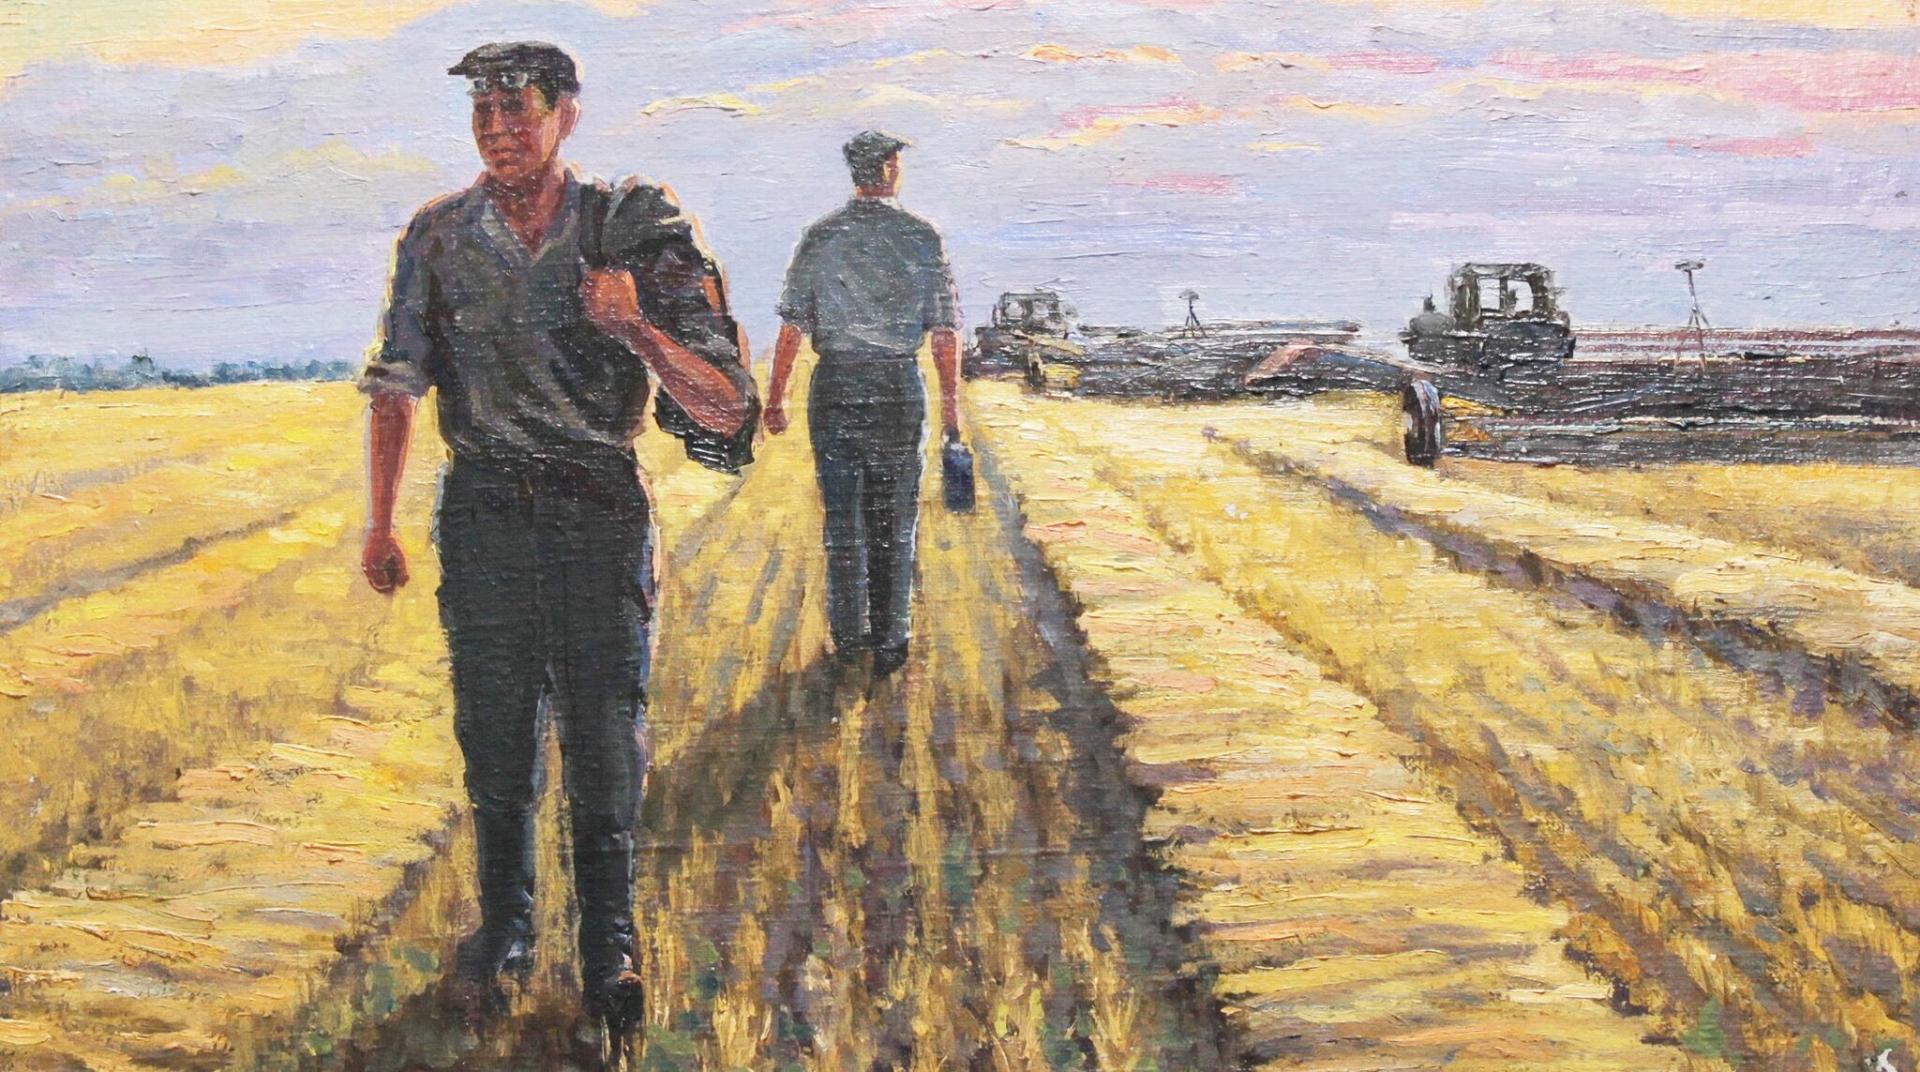 Константин Гуральчук. Пашня. Два тракториста. 1952